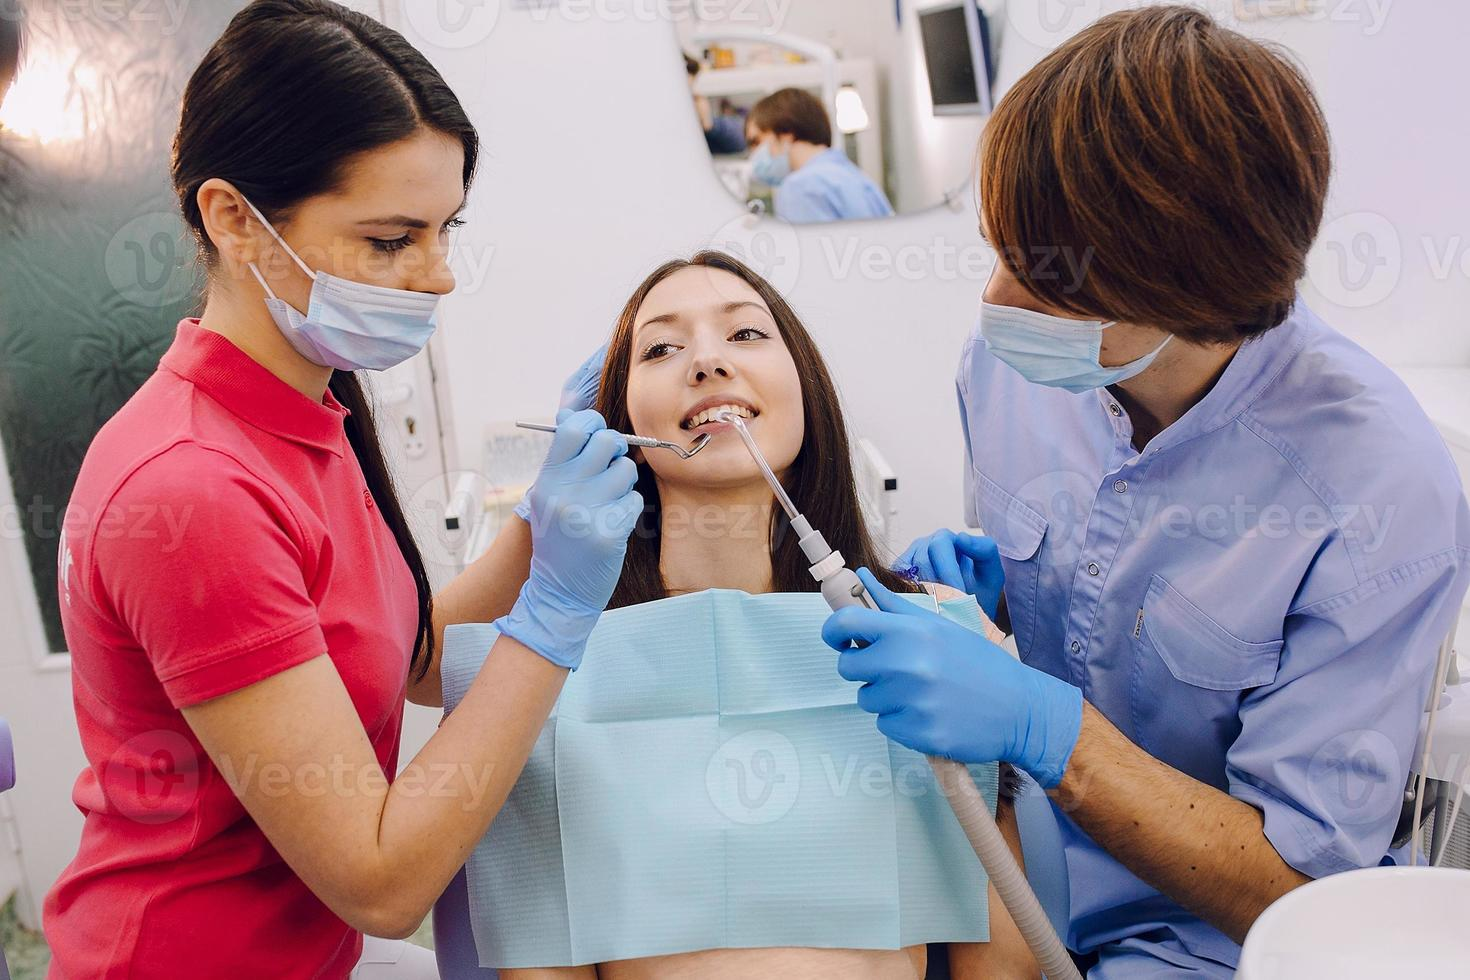 visita ao dentista foto